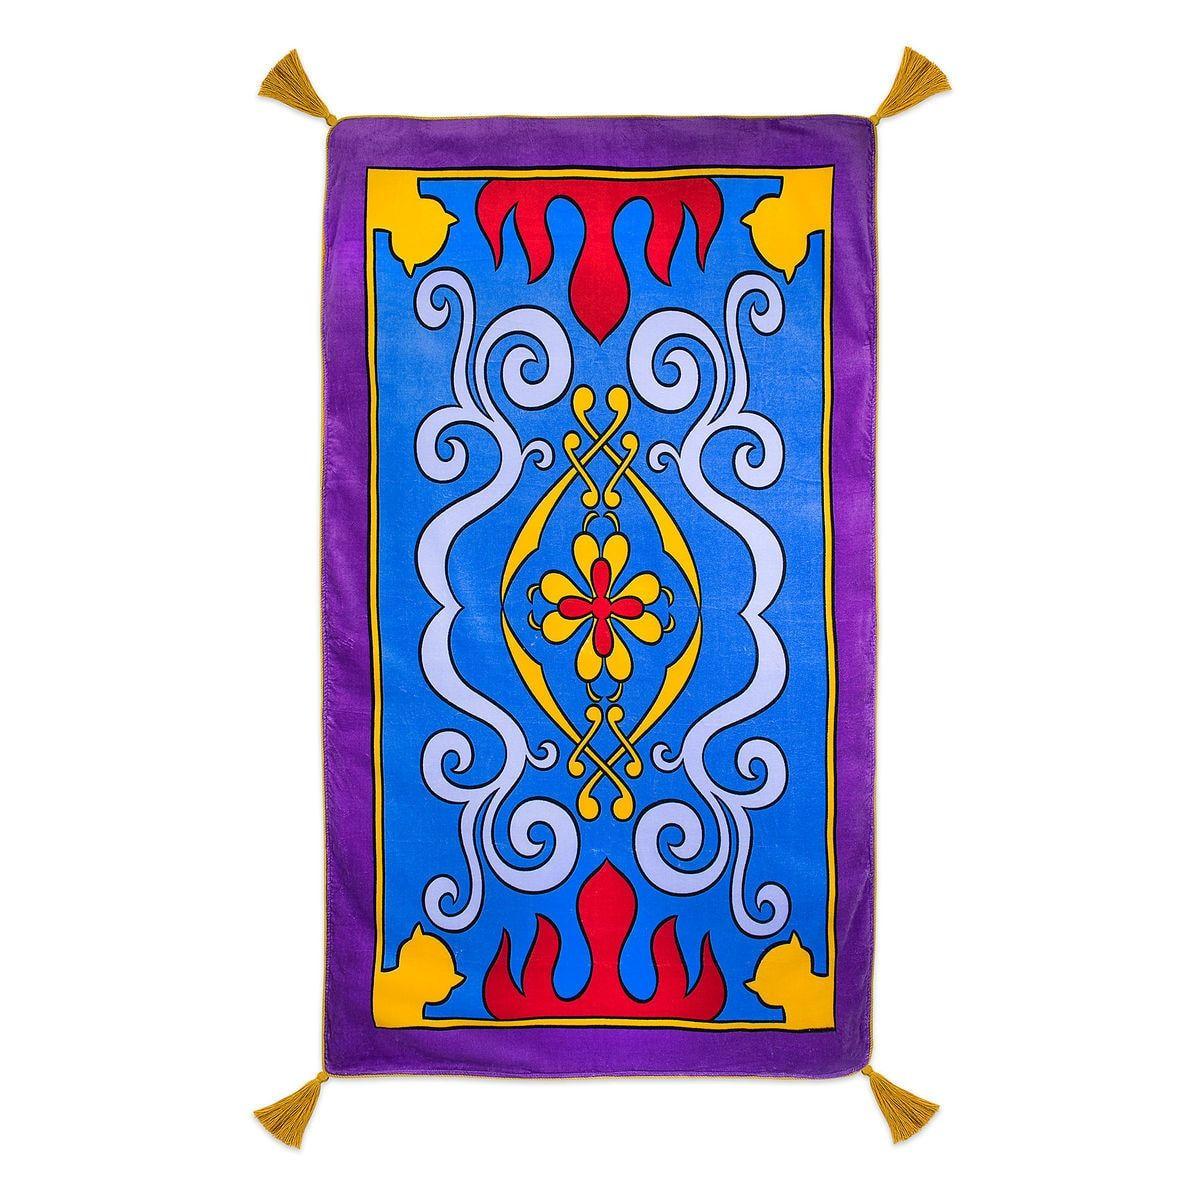 Oh My Disney S New Swim Collection Is An Unbelievable Sight Aladdin Magic Carpet Aladdin Carpet Aladdin